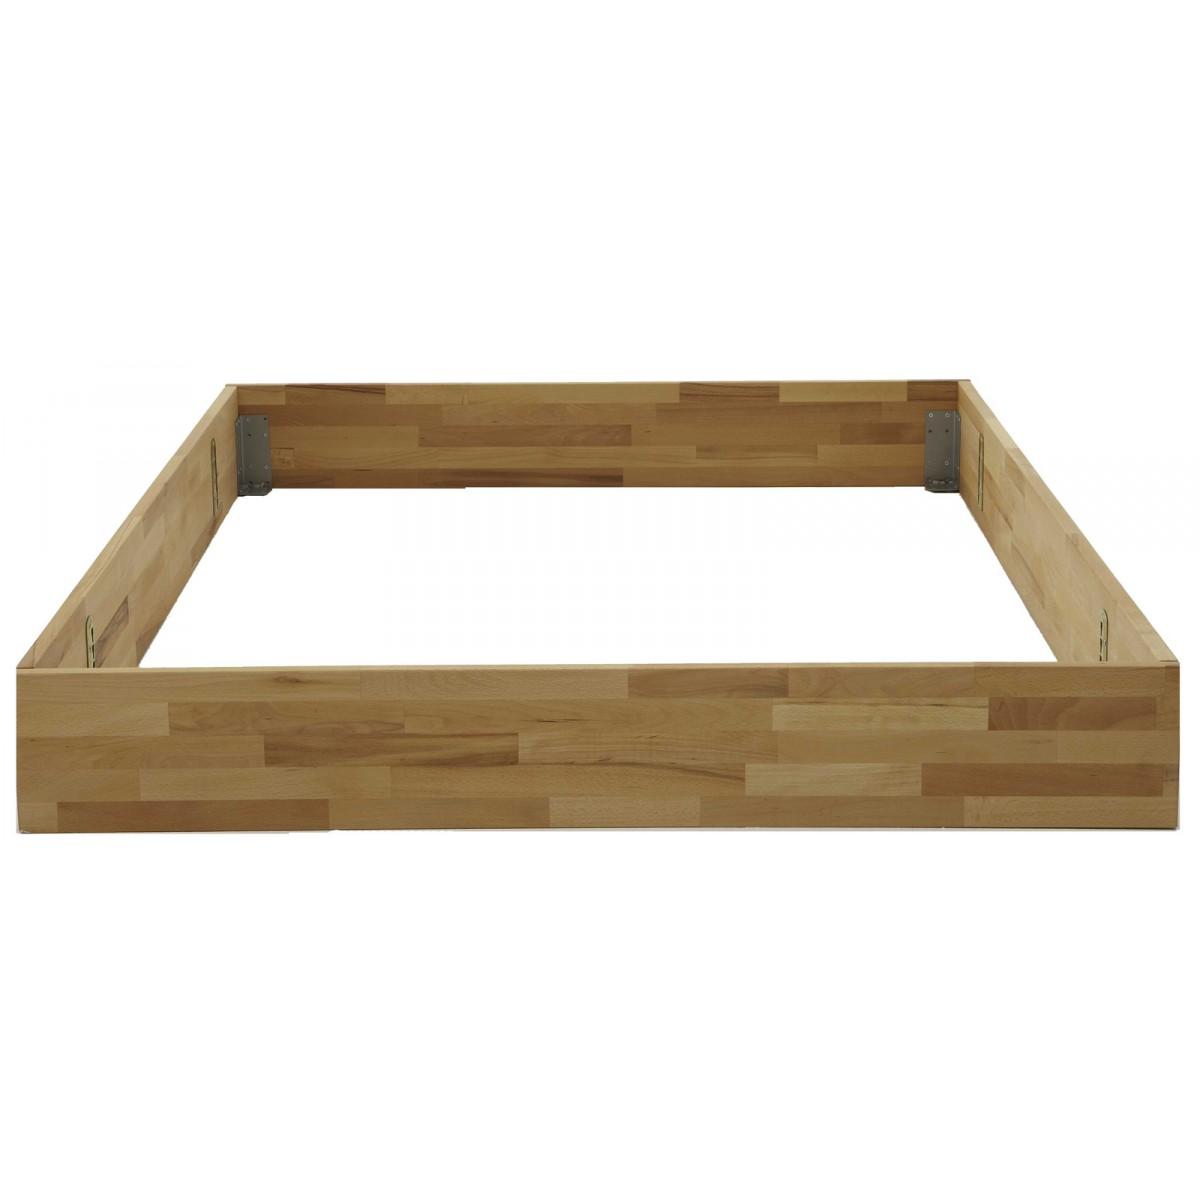 dico modular bett kernbuche bett teakwoodstore24. Black Bedroom Furniture Sets. Home Design Ideas